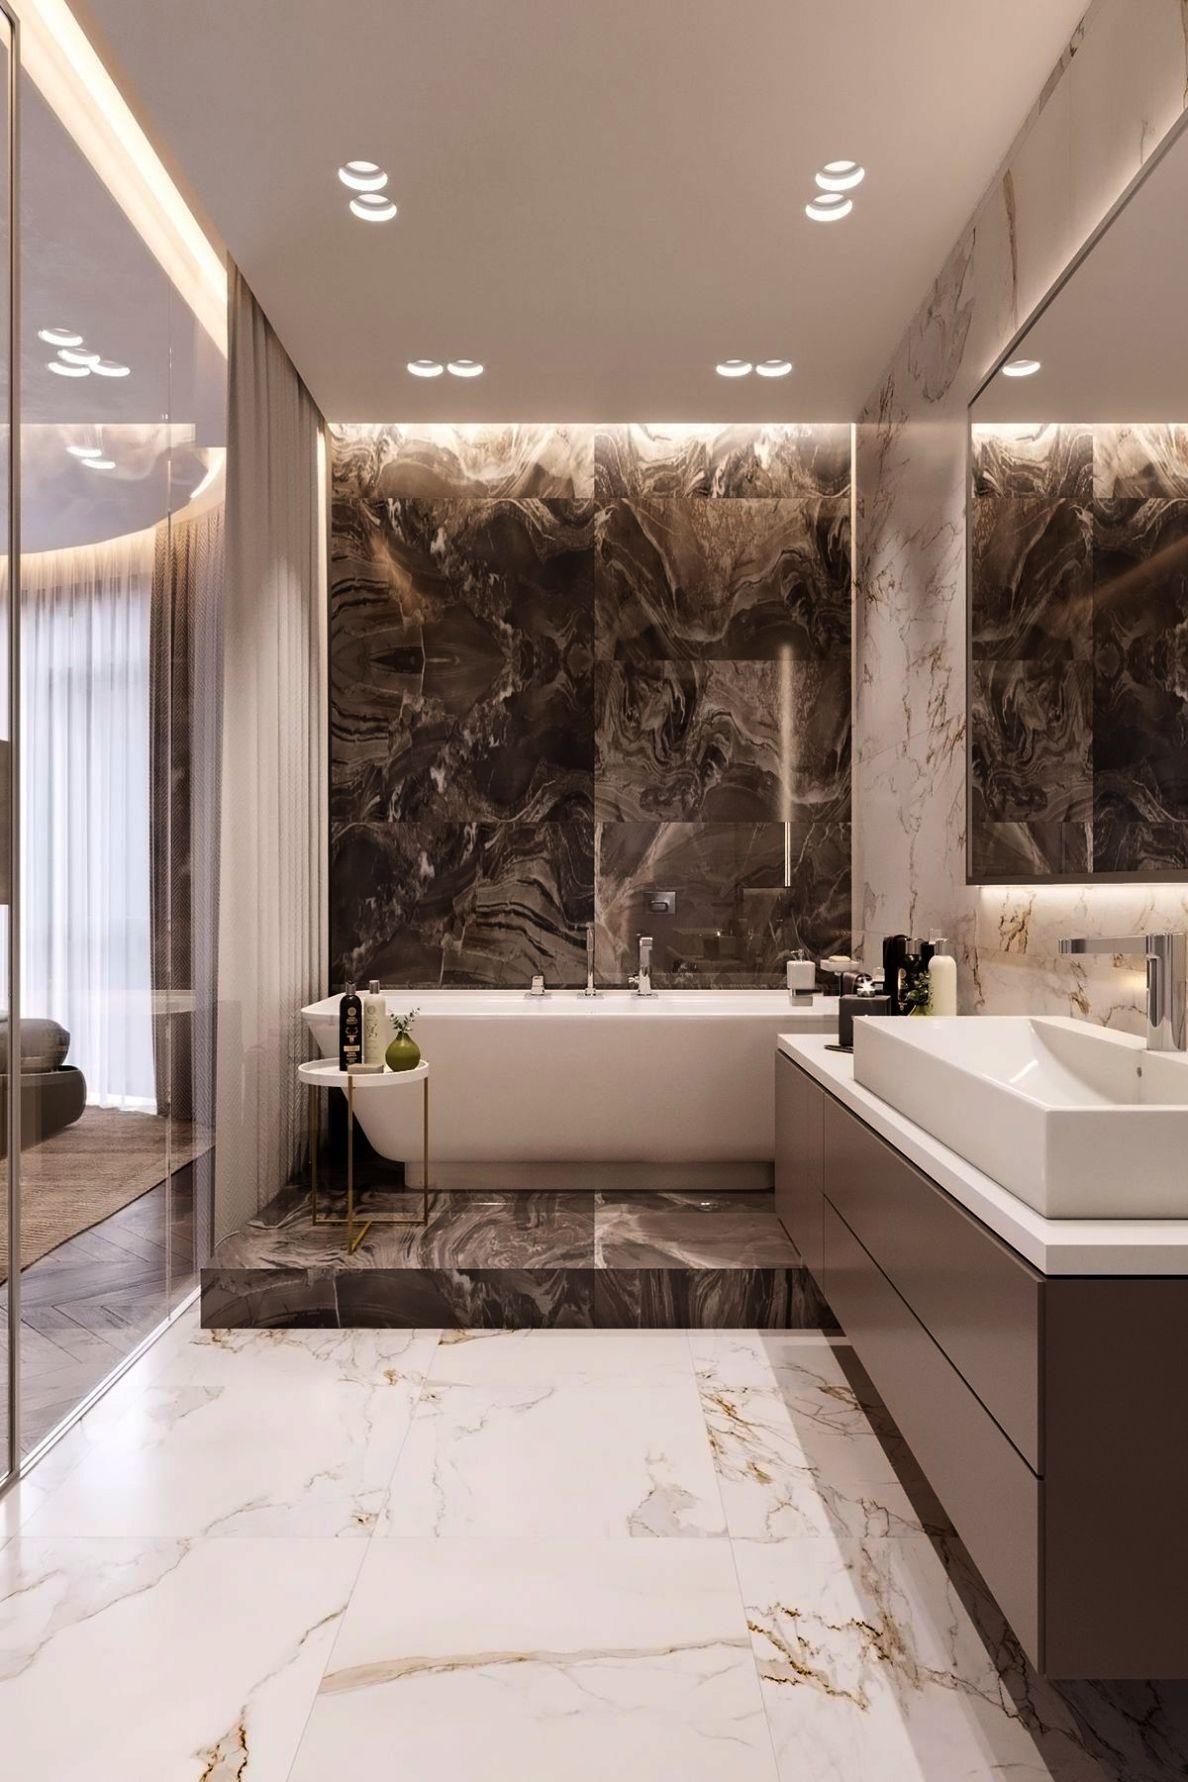 Bathroom Mirrors Dallas Out Bathroom Mirrors Extendable Among Bathroom Vanities G Bathroom Inspiration Modern Spa Bathroom Design Contemporary Bathroom Designs